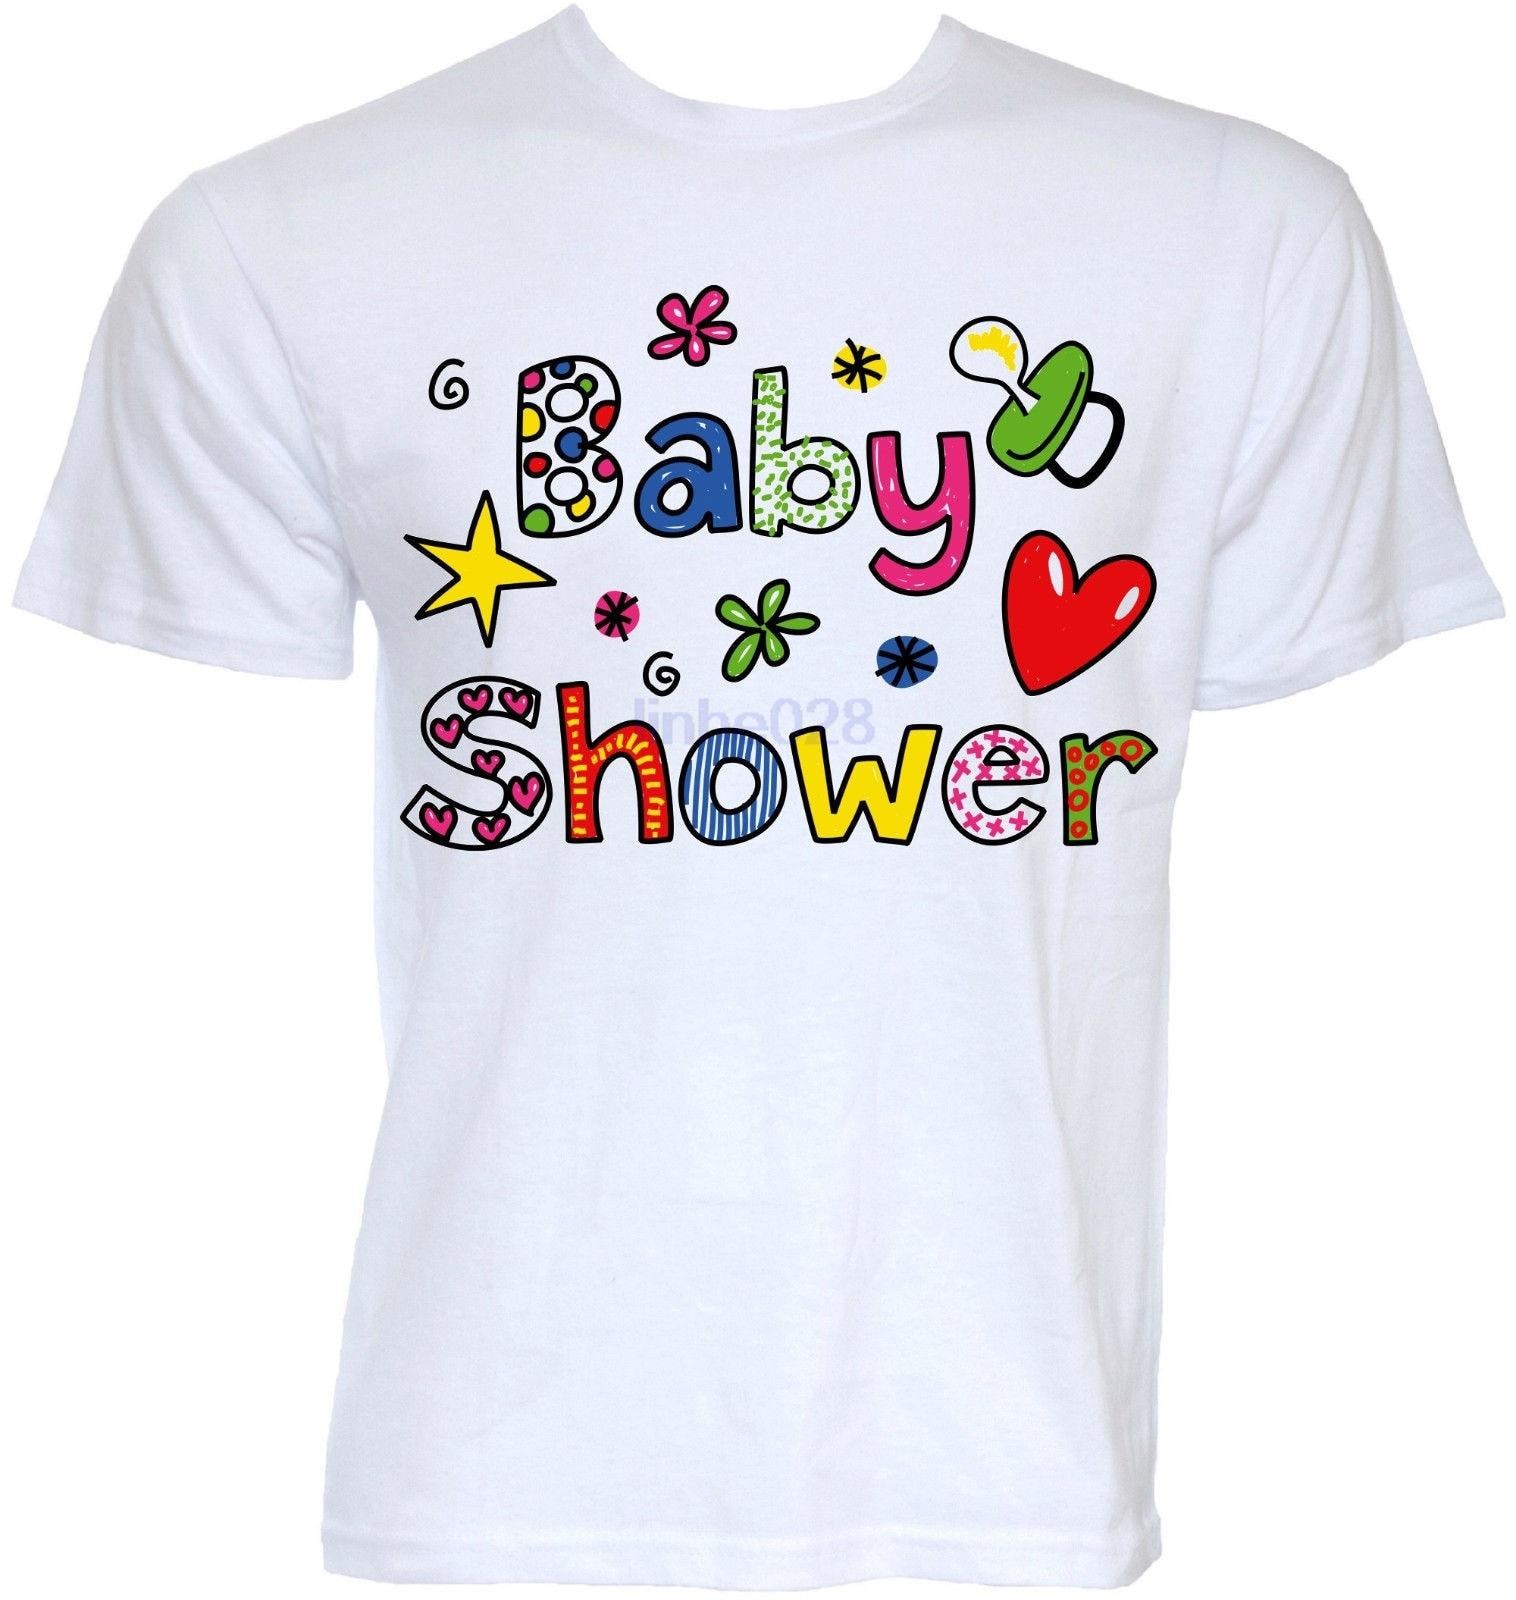 FUNNY COOL NOVELTY NEW BABY SHOWER MUM PREGNANCY JOKE T